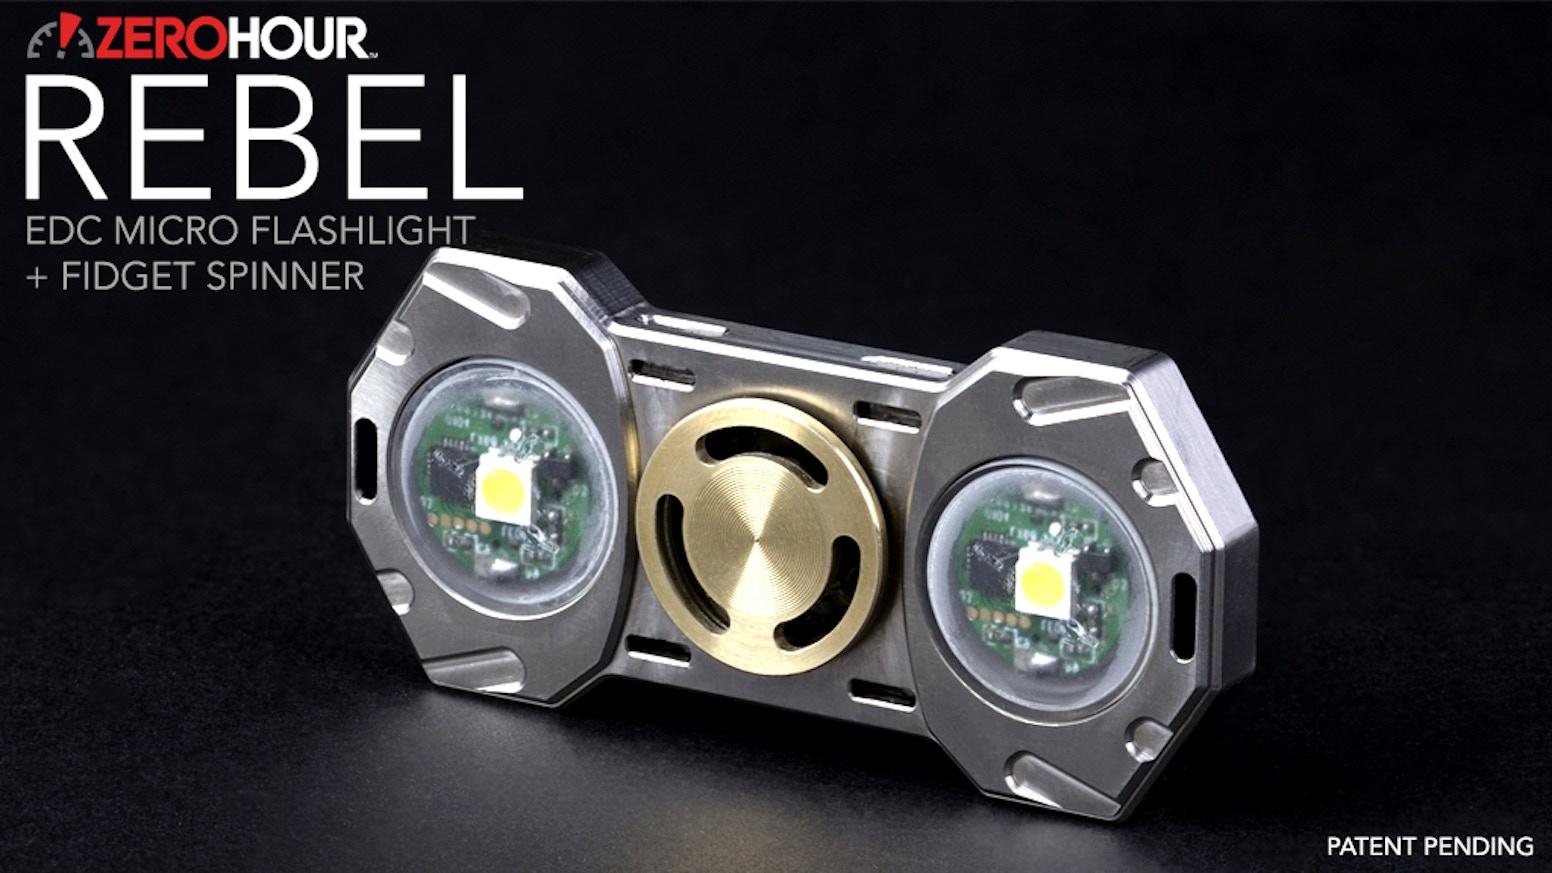 Zerohour Rebel Edc Microlight Flashlight Fidget Spinner